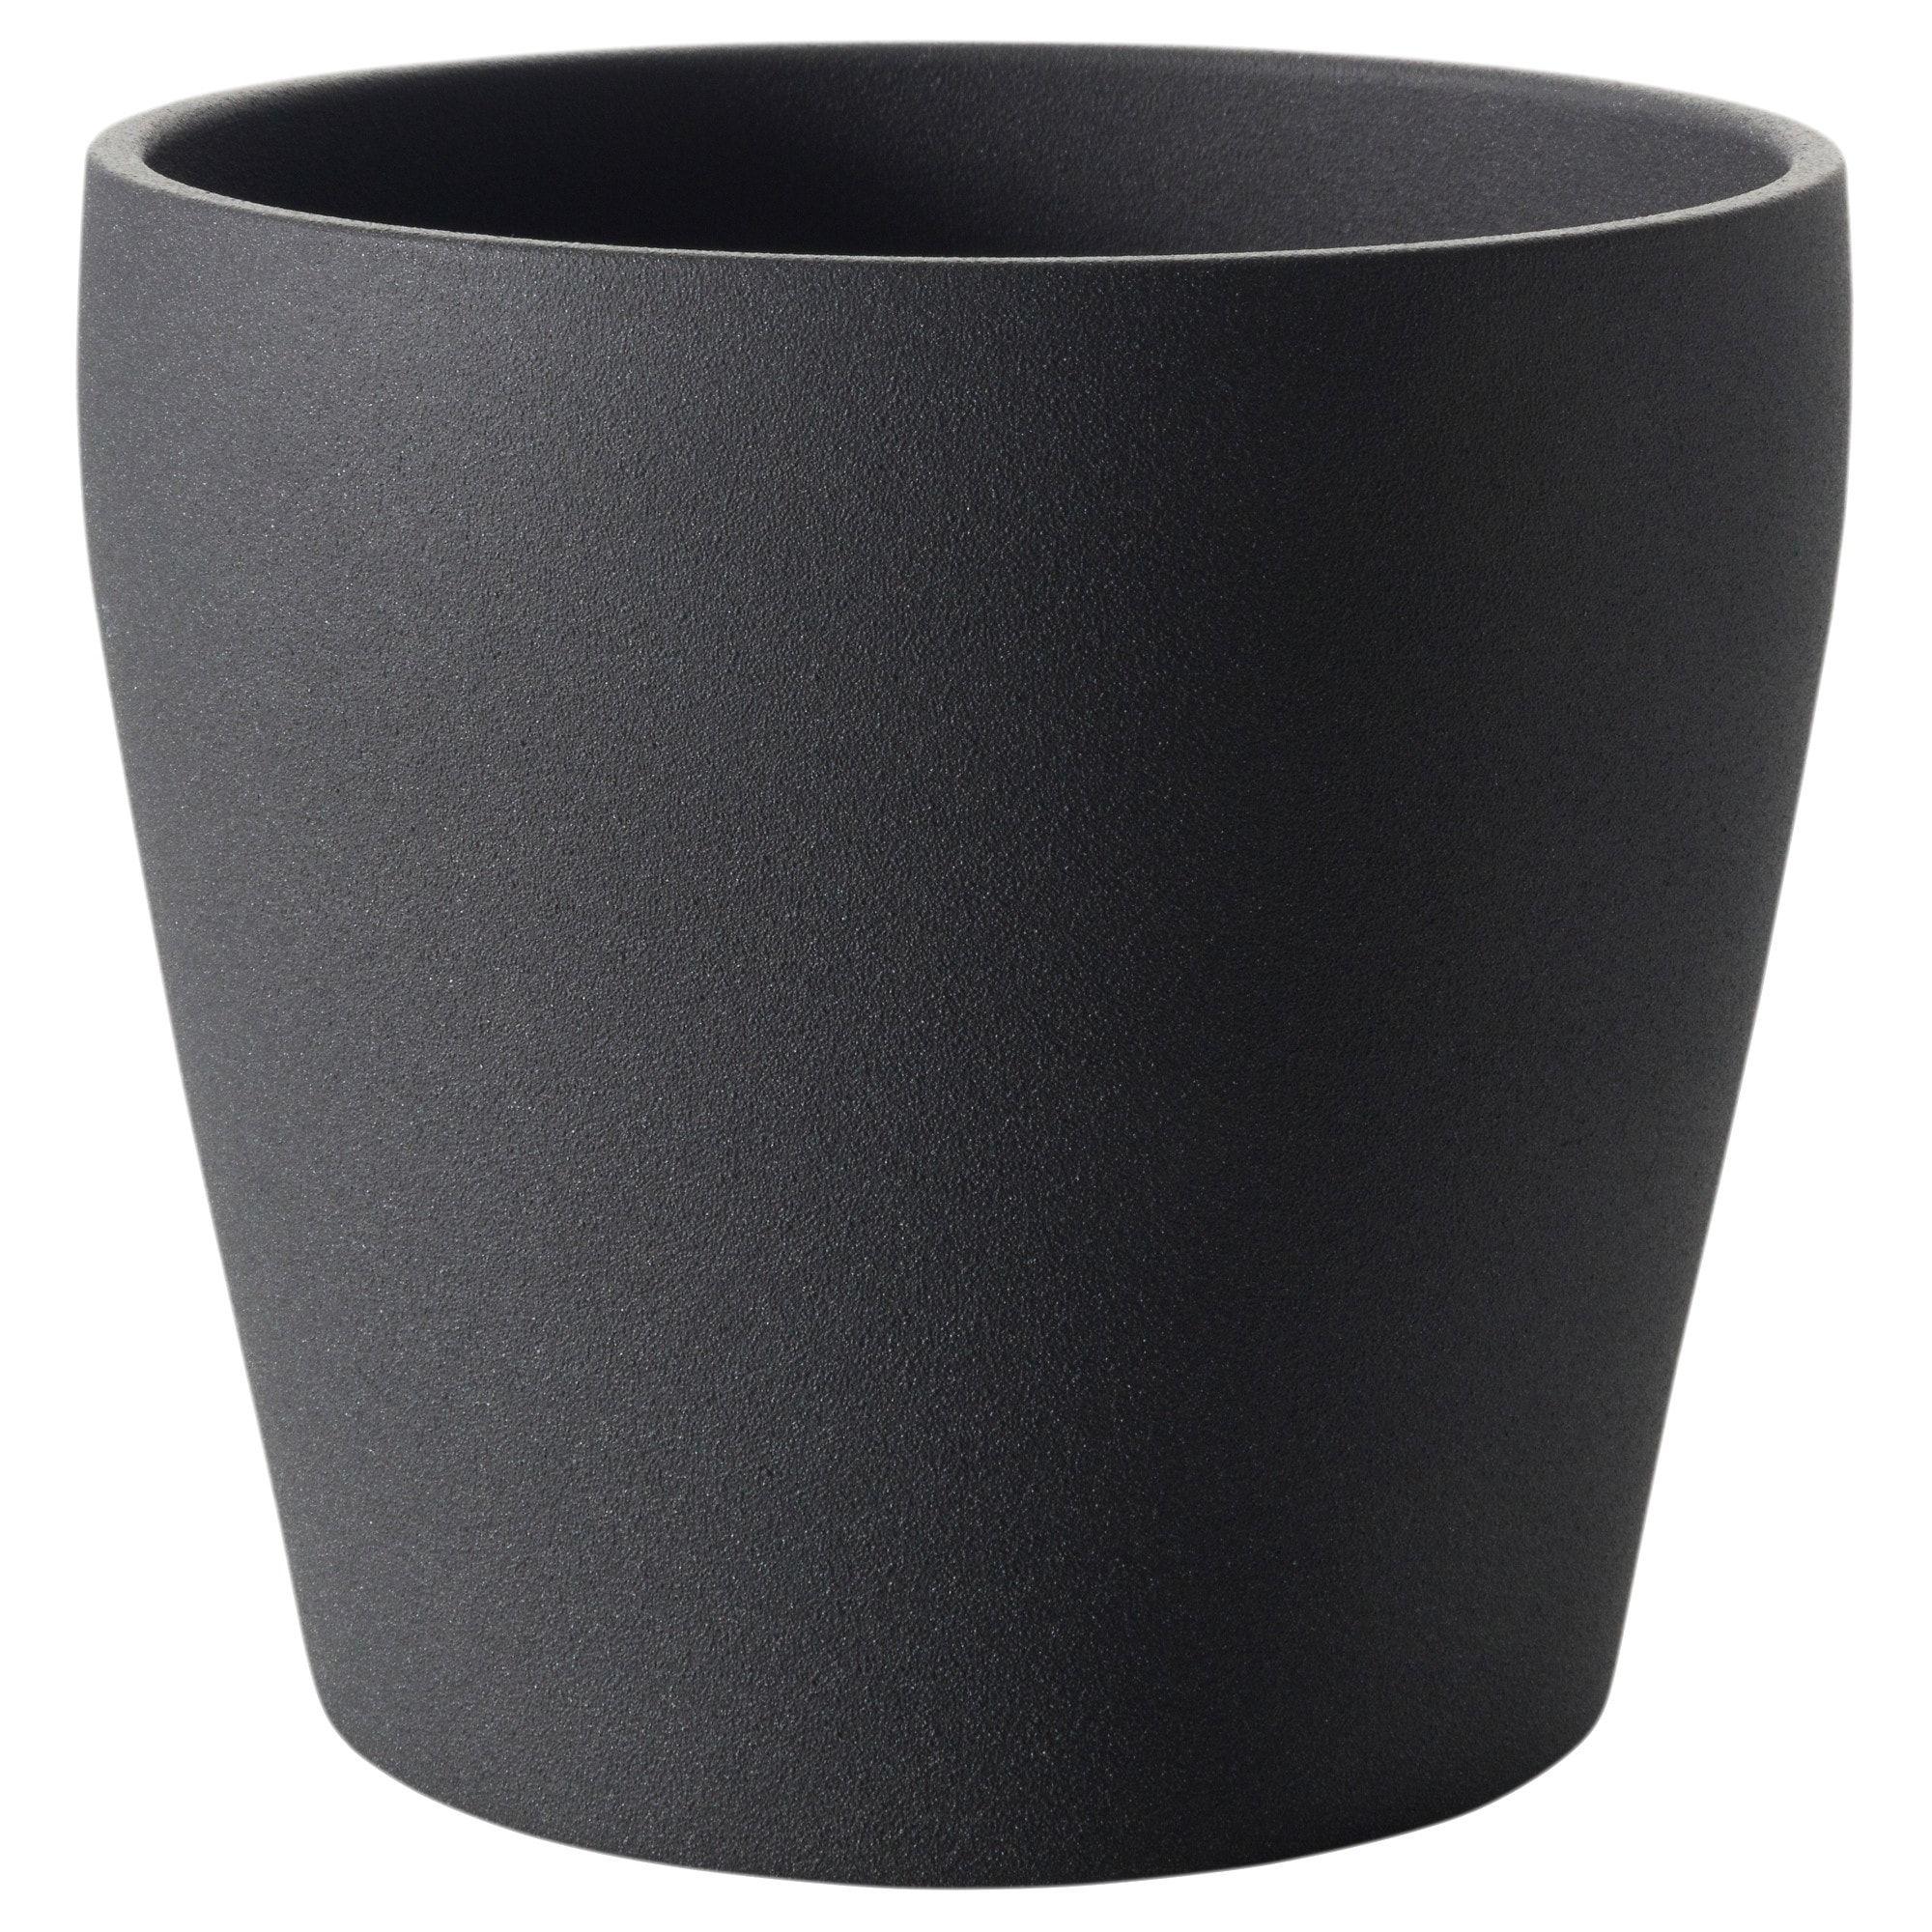 Persillade Kvetinac Tmave Seda Indoor Plant Pots Ikea Potted